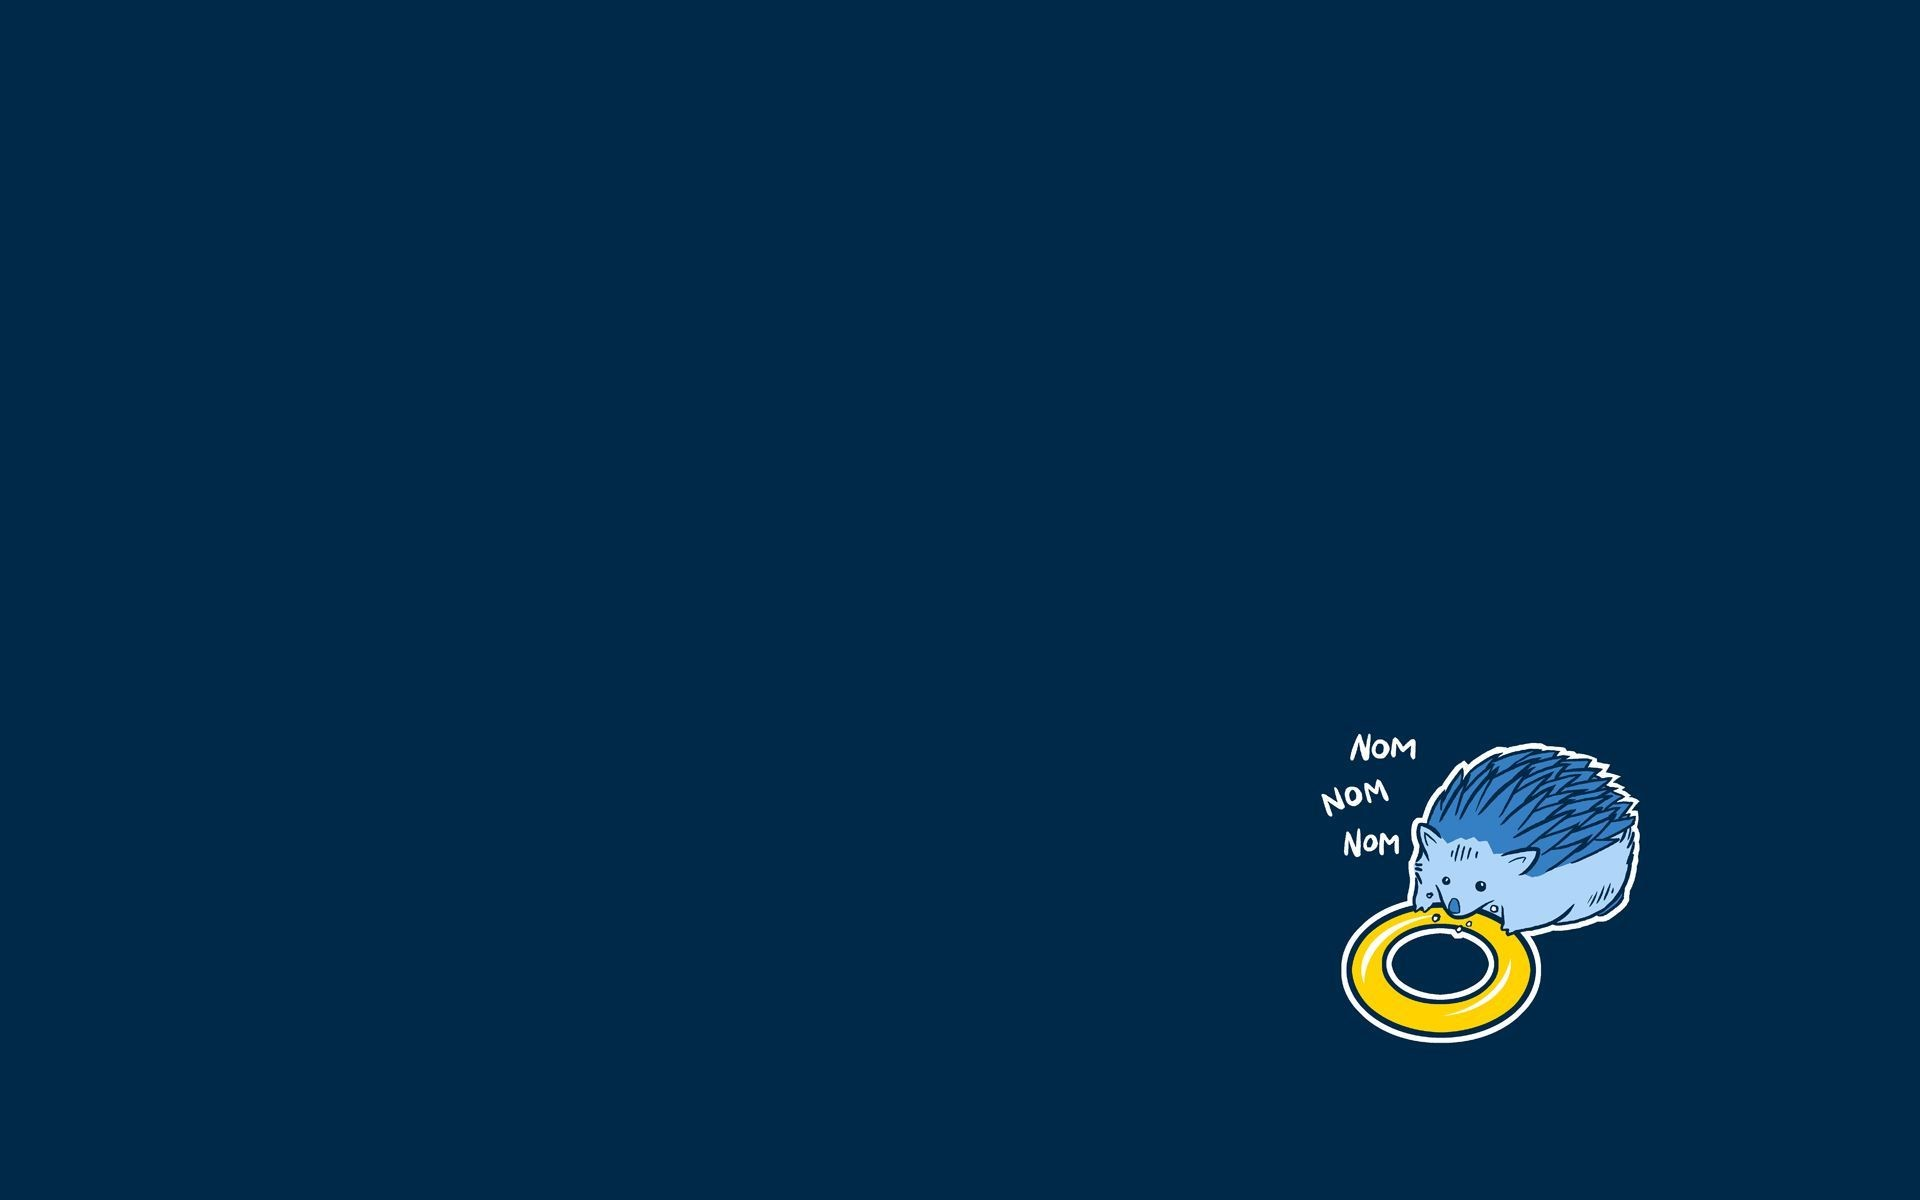 Sonic HD Wallpapers, 38.58 Kb, Britany Tomasek